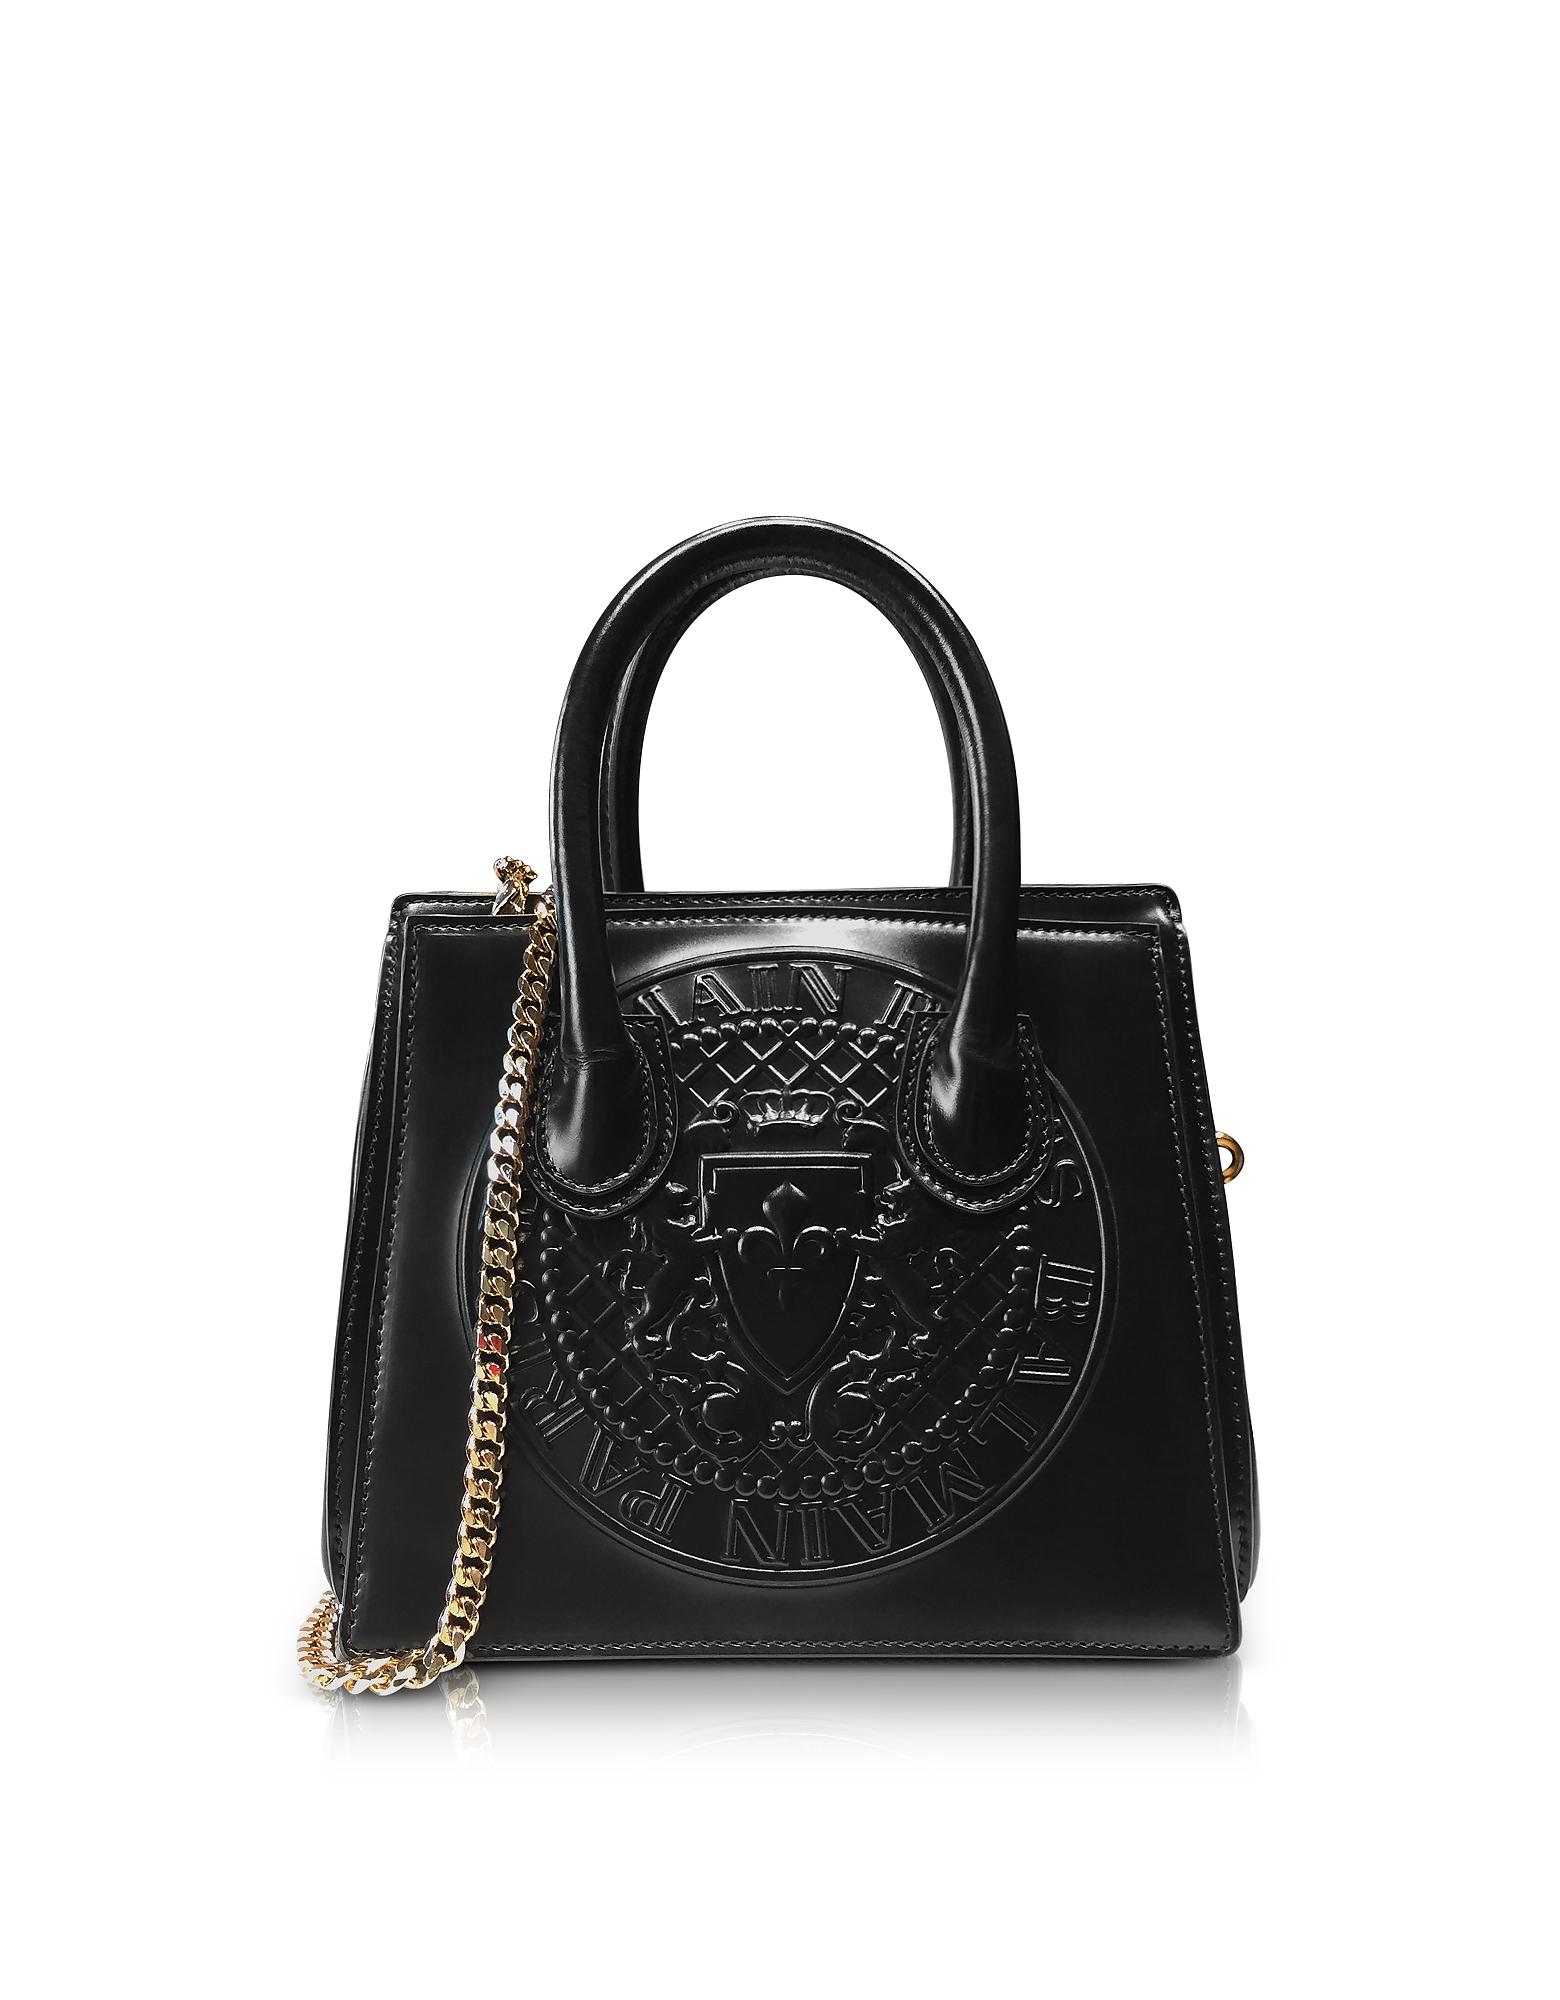 Balmain Handbags, 3D Black Glossy Leather Mini Top Handle Bag w/Embossed Blazon